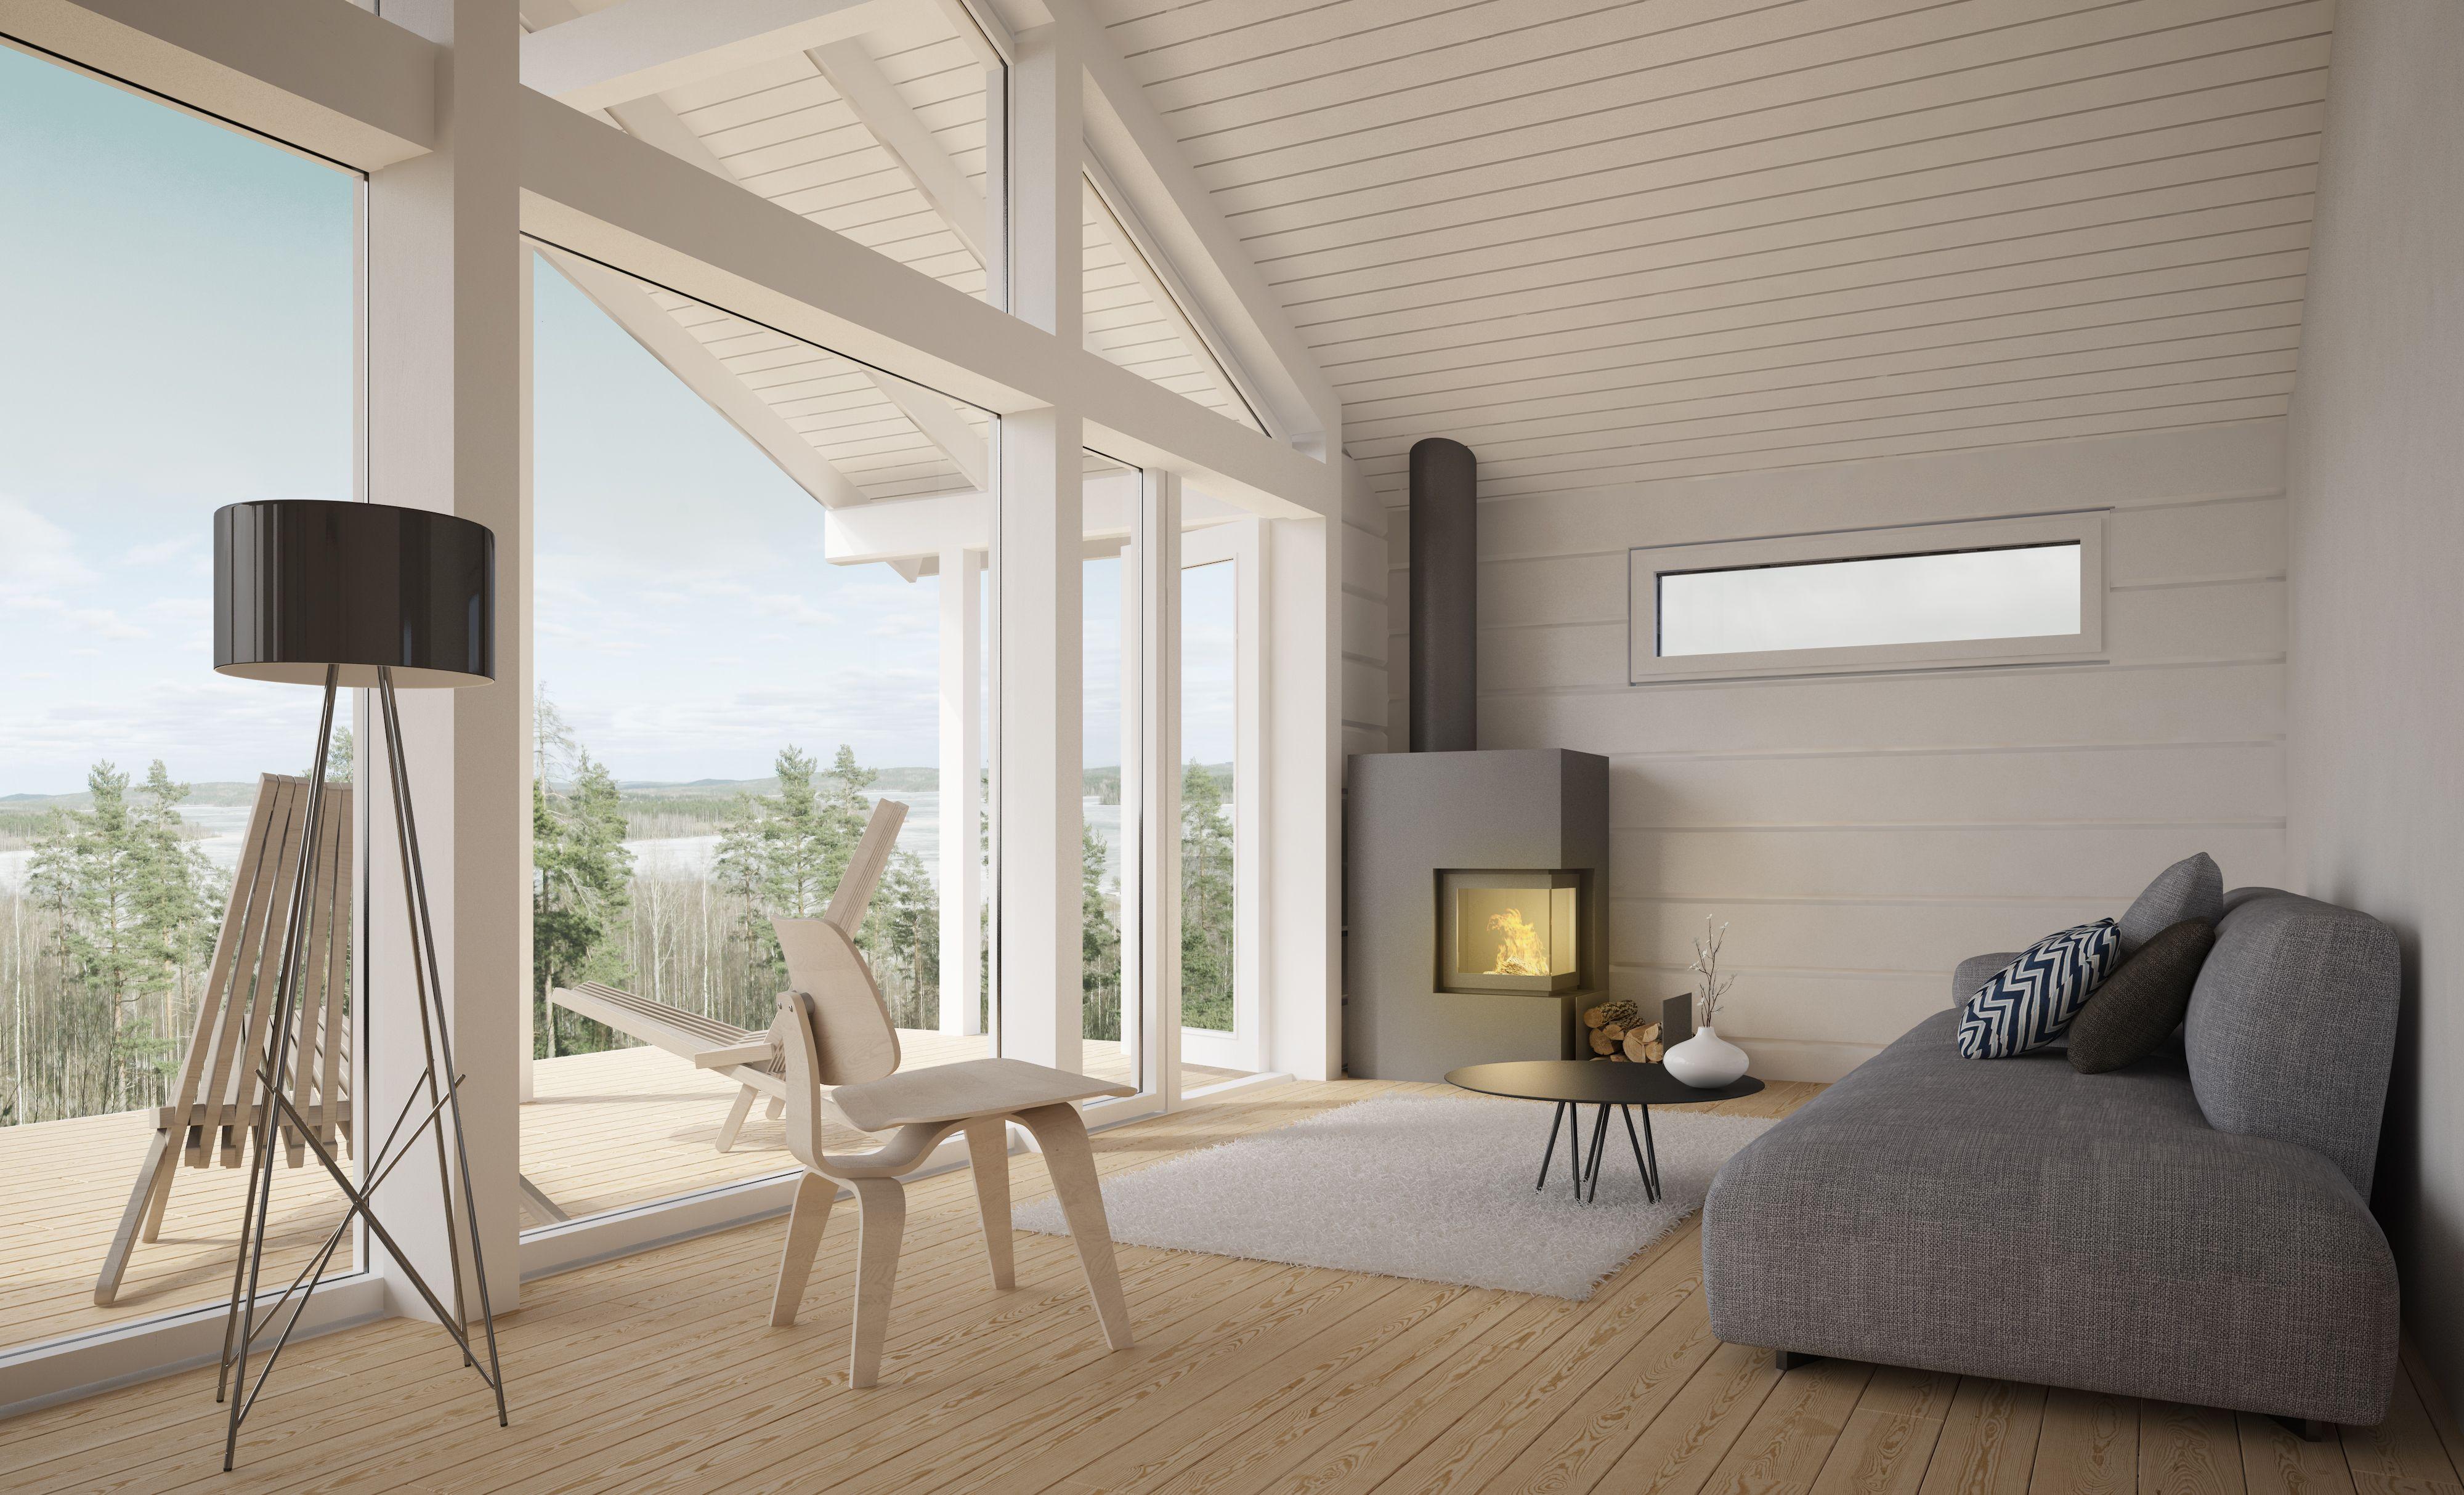 honka sirius holiday home mökki pinterest log cabins cabin